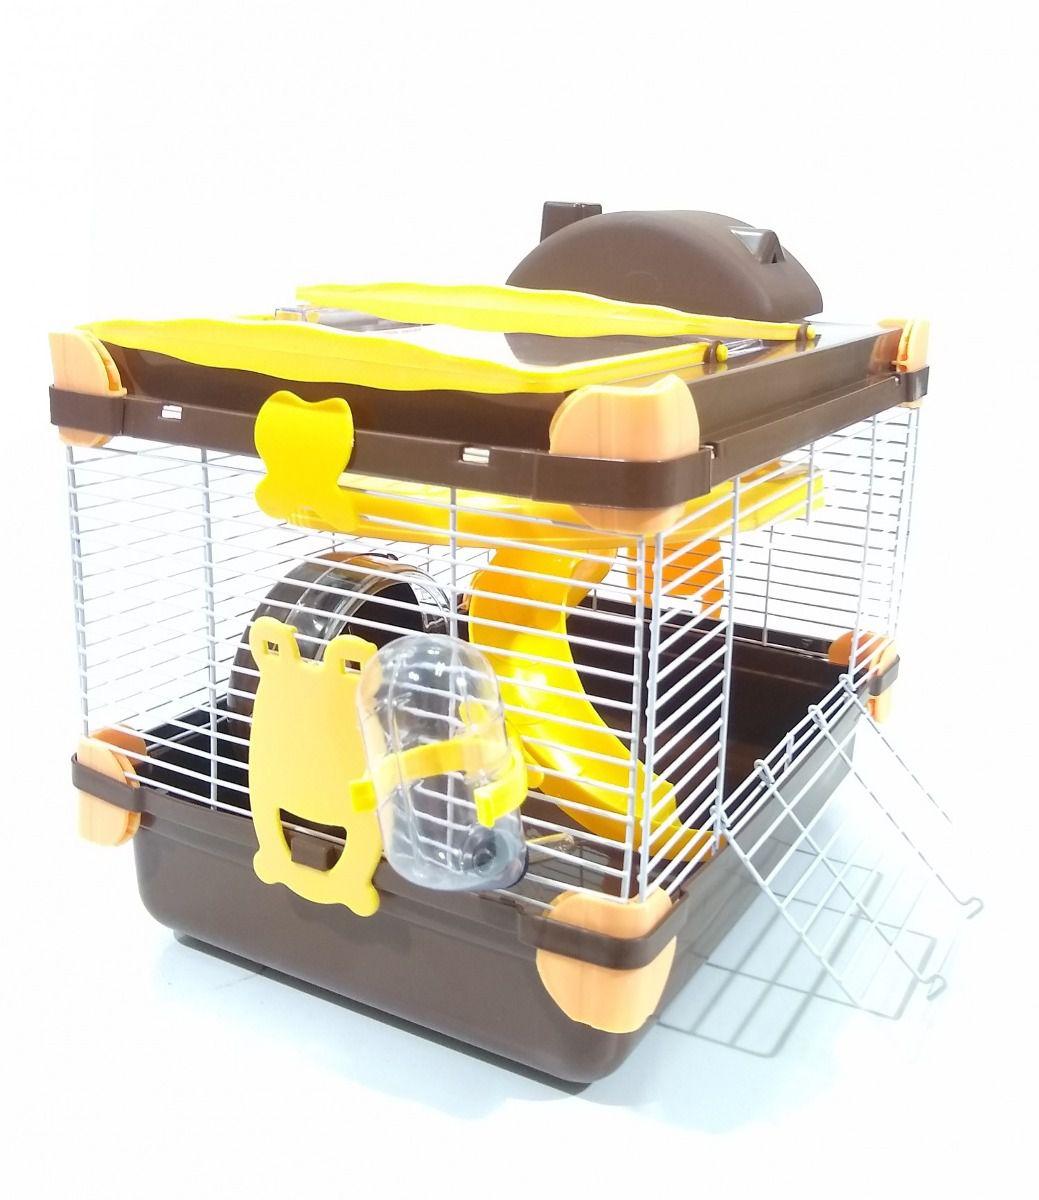 Gaiola Hamster Vip Acrílico Completa Marrom 24cm x 30cm x 24cm